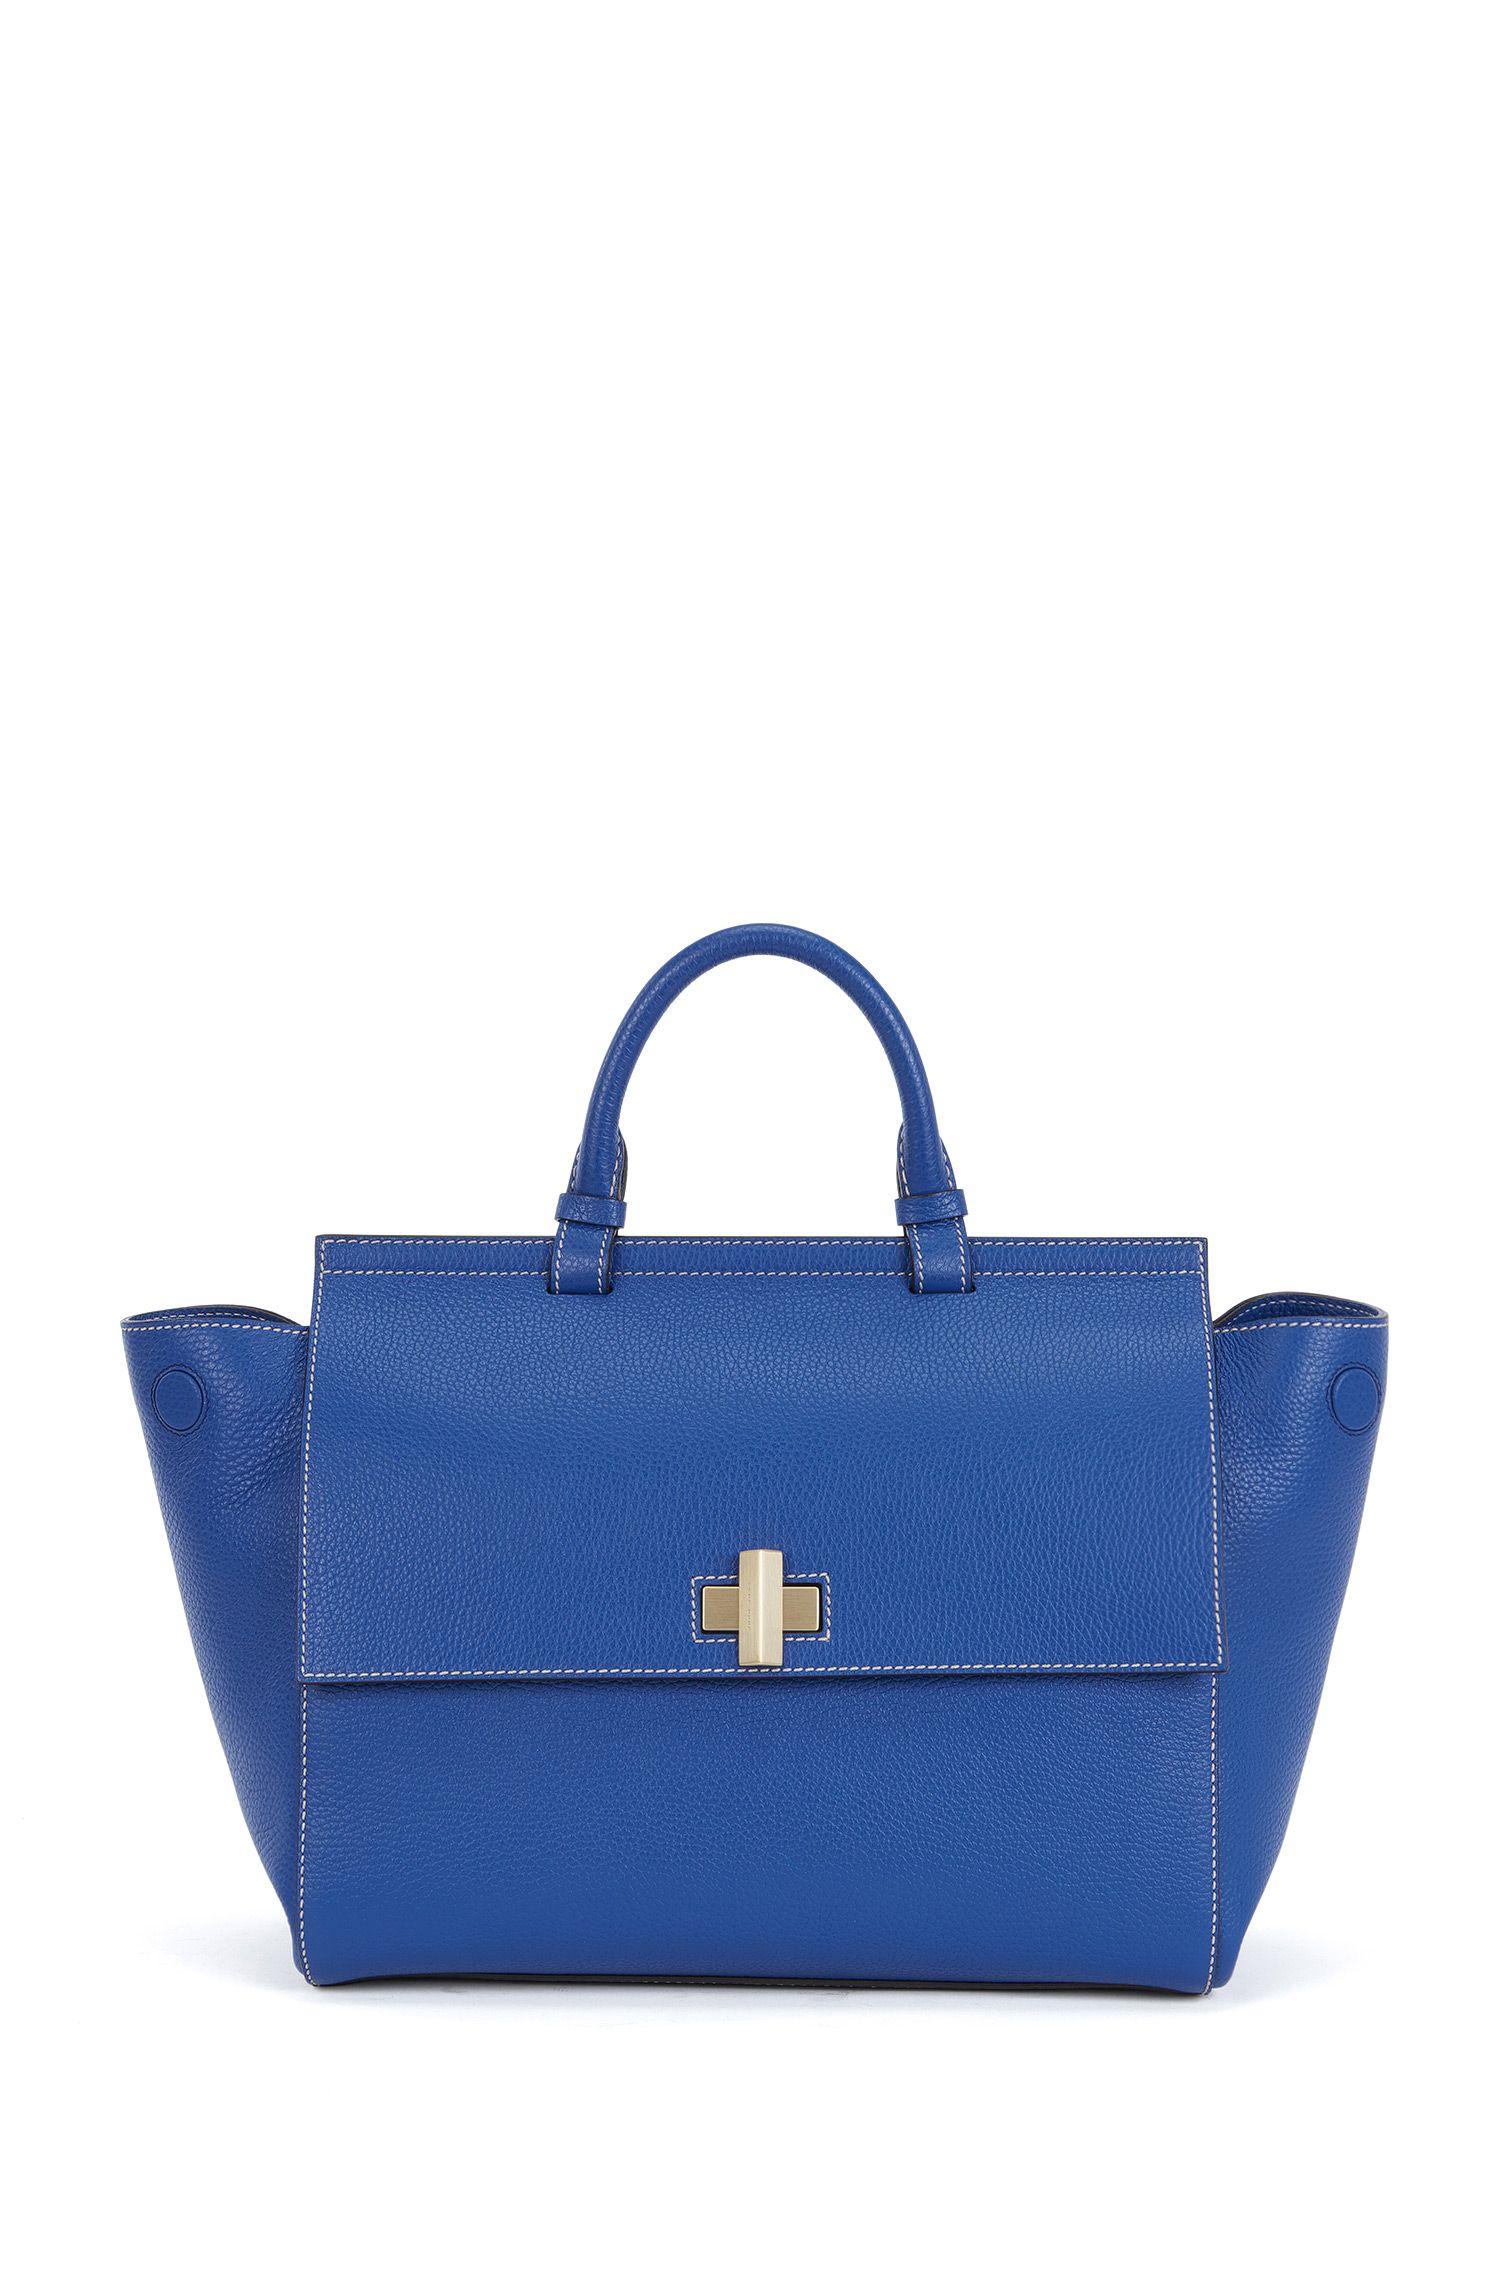 'BOSS Bespoke Soft M'   Leather Grained Satchel Handbag, Light Blue